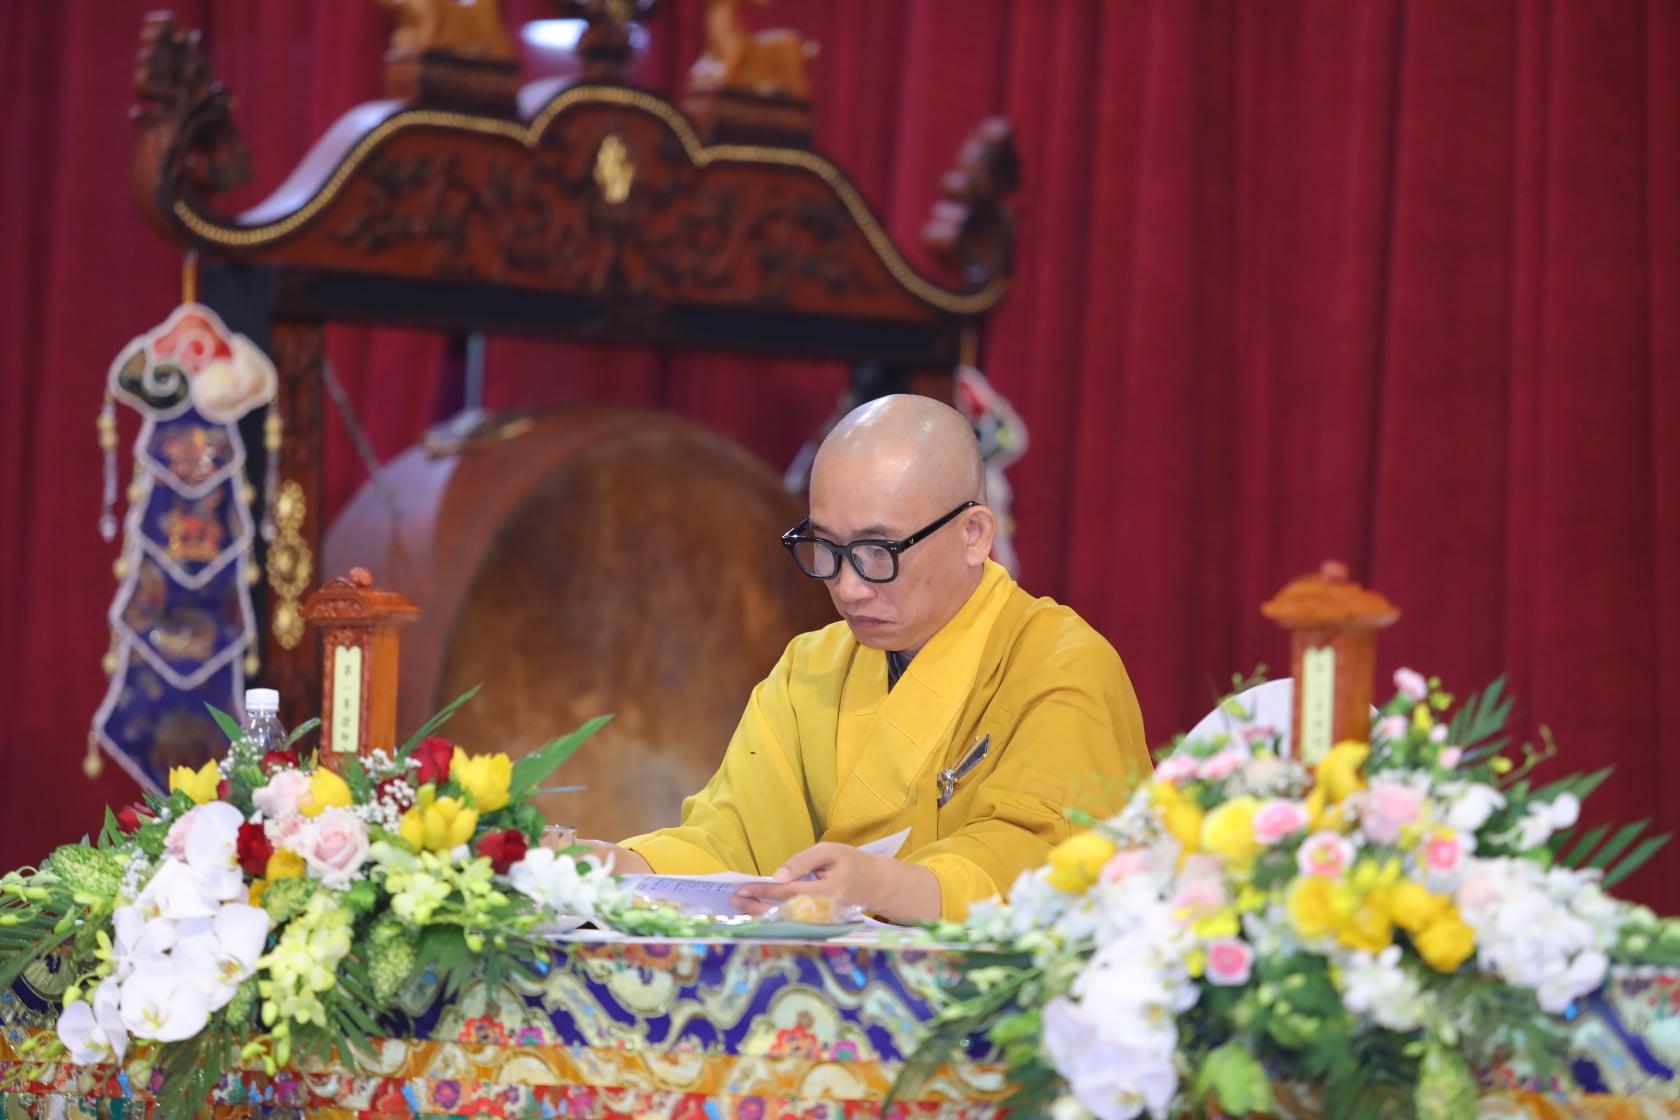 Thang Nghiem Dai Gioi Dan IV (103)